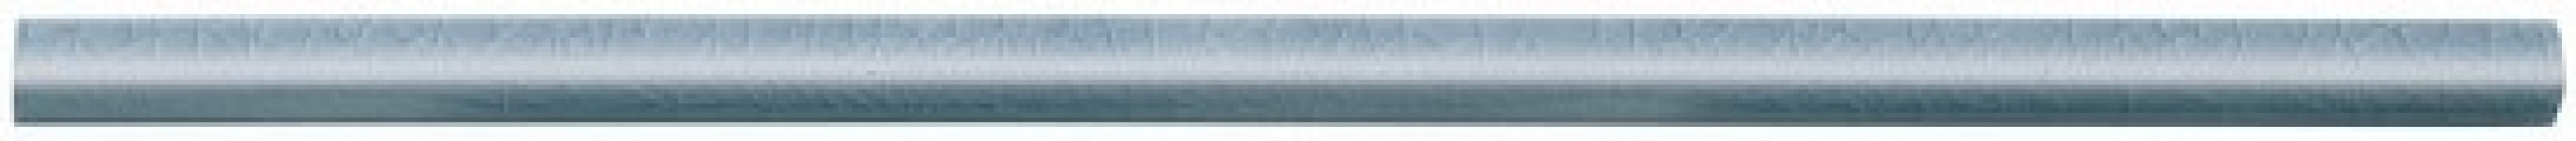 Бордюр Modernista ADMO5426 Bullnose Trim C/C Stellar Blue 0.85x20 Adex